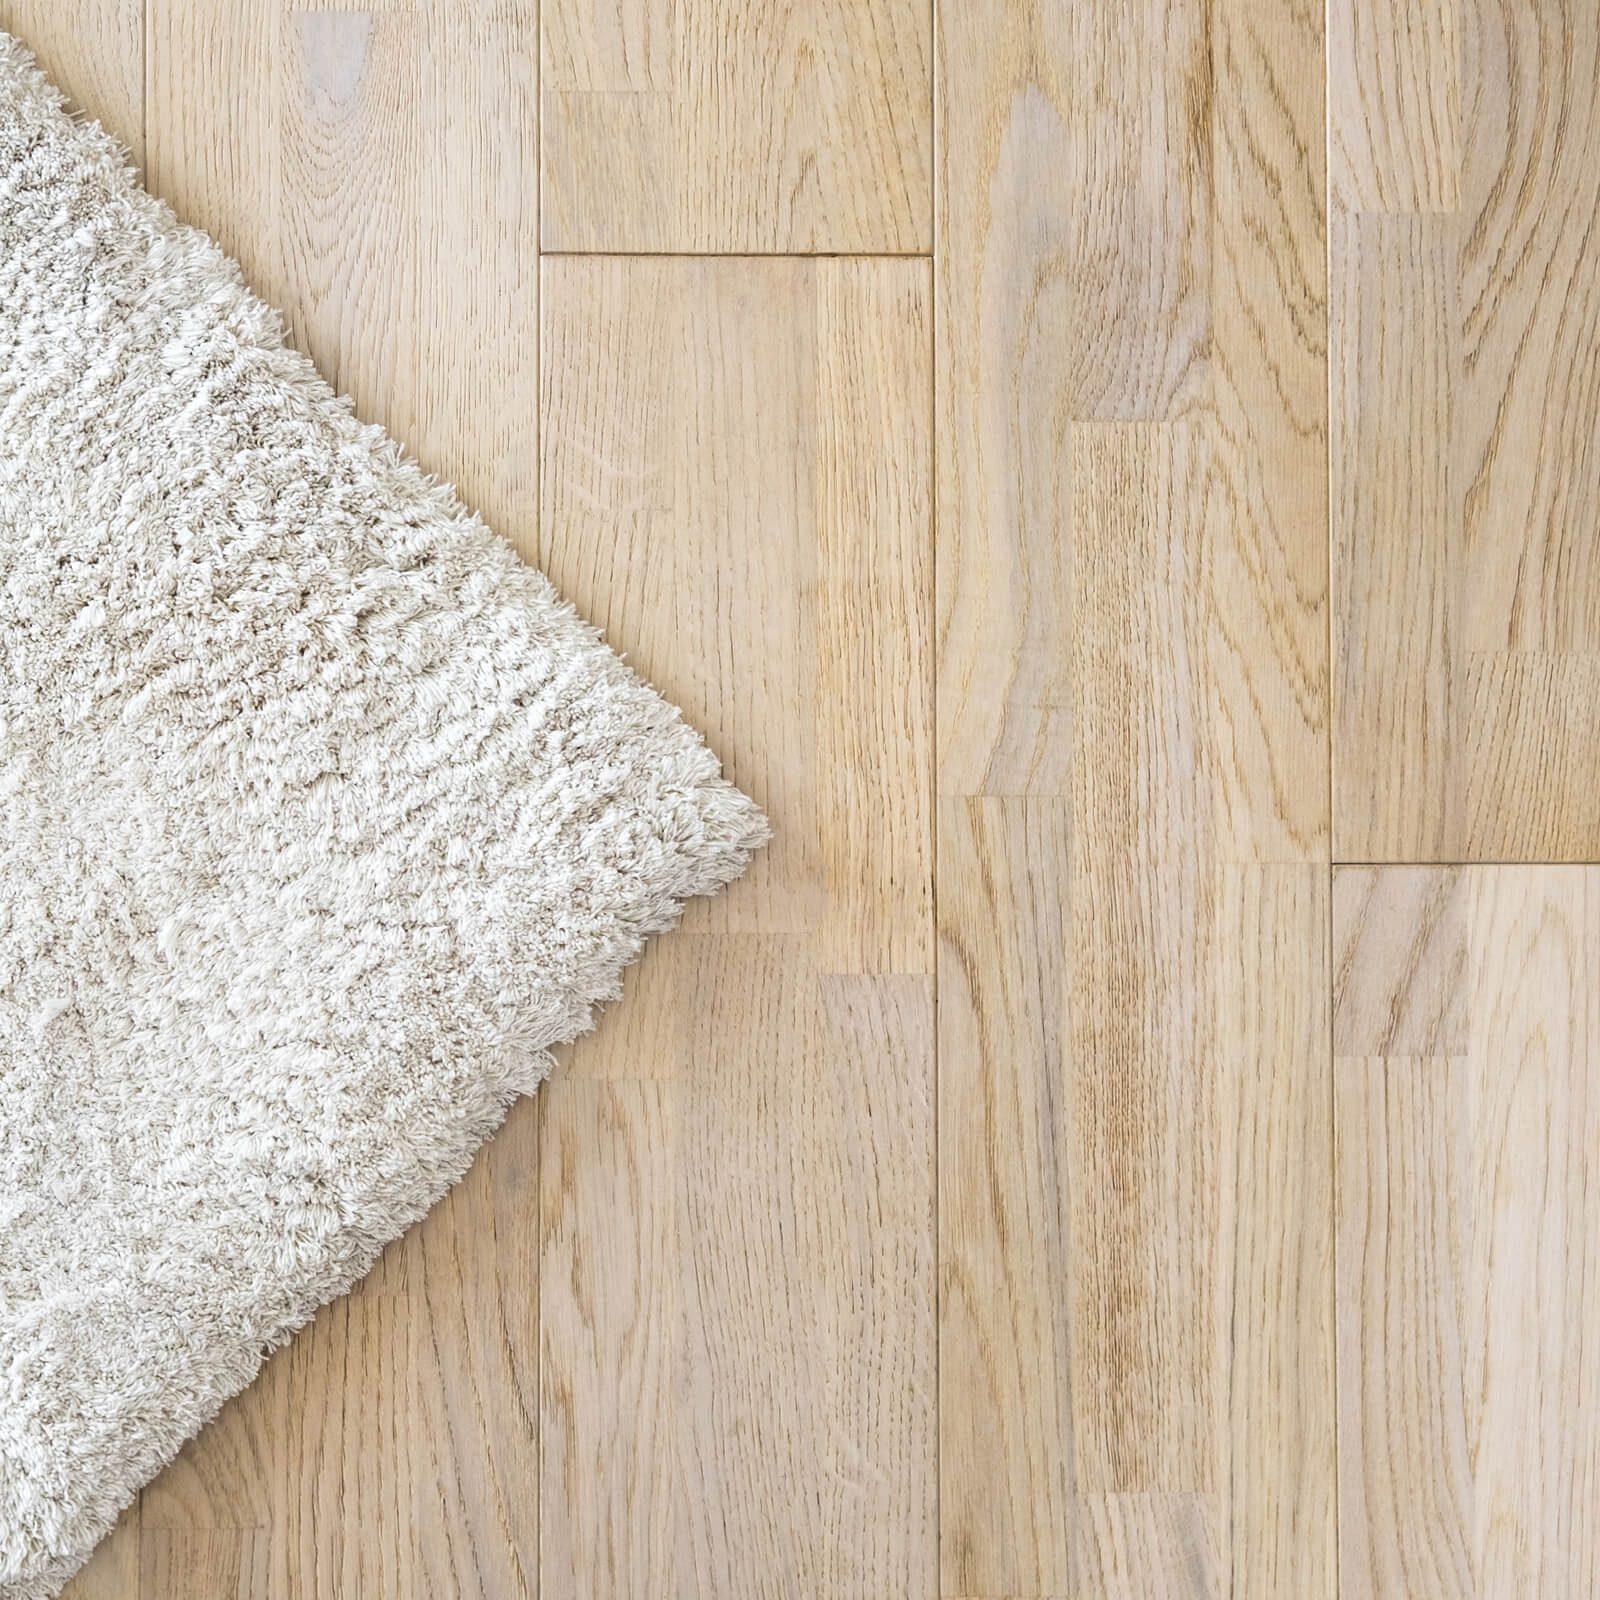 Hardwood faqs | Price Flooring